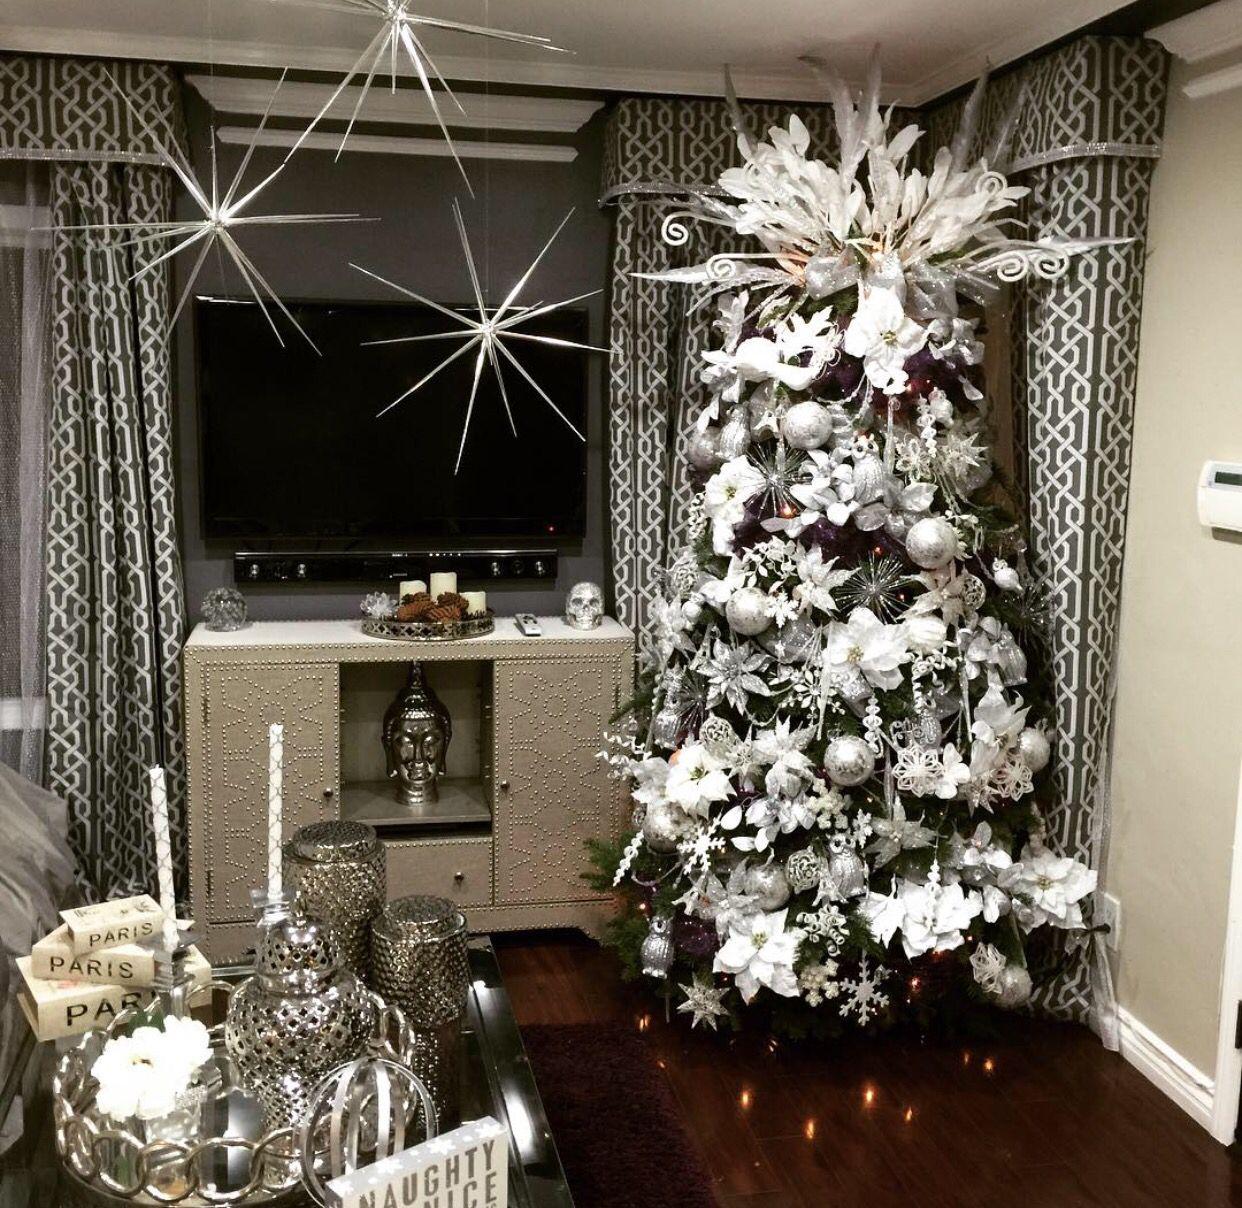 My Christmas Tree Zgallerie Zgallerie Z Gallerie Christmas Tree White Xmas Tree Christmas Tree